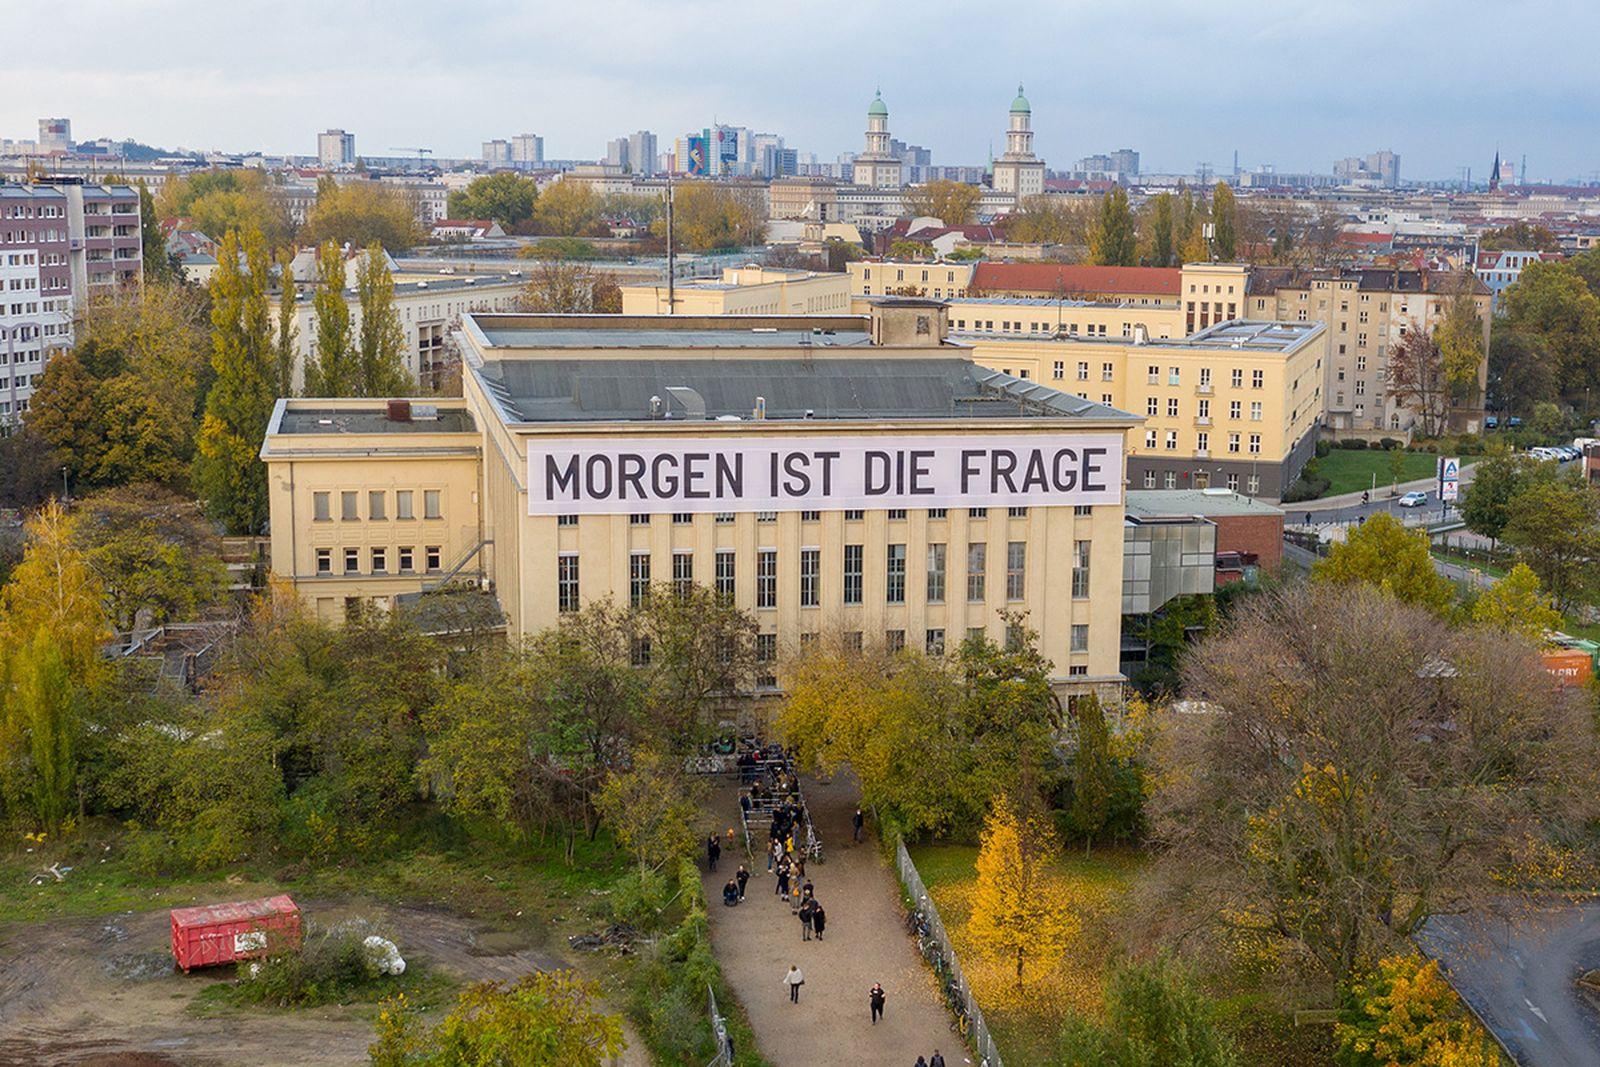 bottega-venetas-secret-berghain-show-was-a-glimpse-at-berlins-future-main